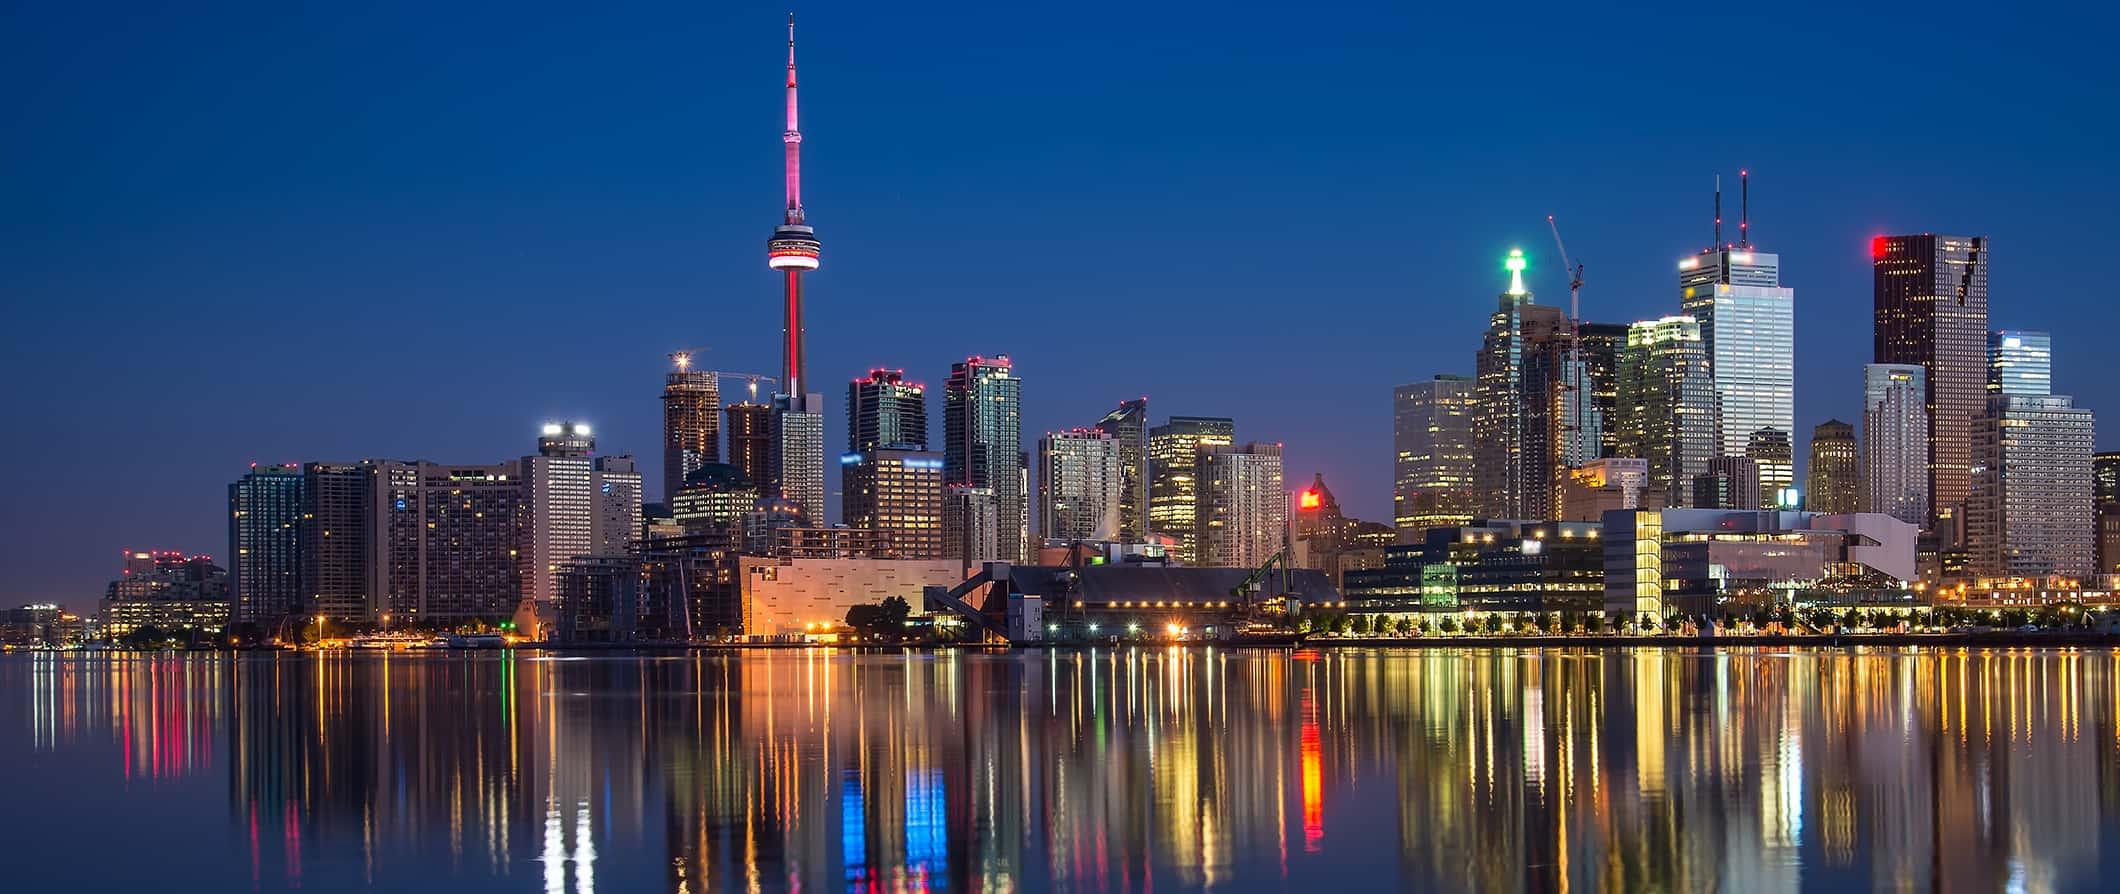 Toronto skyline with reflection